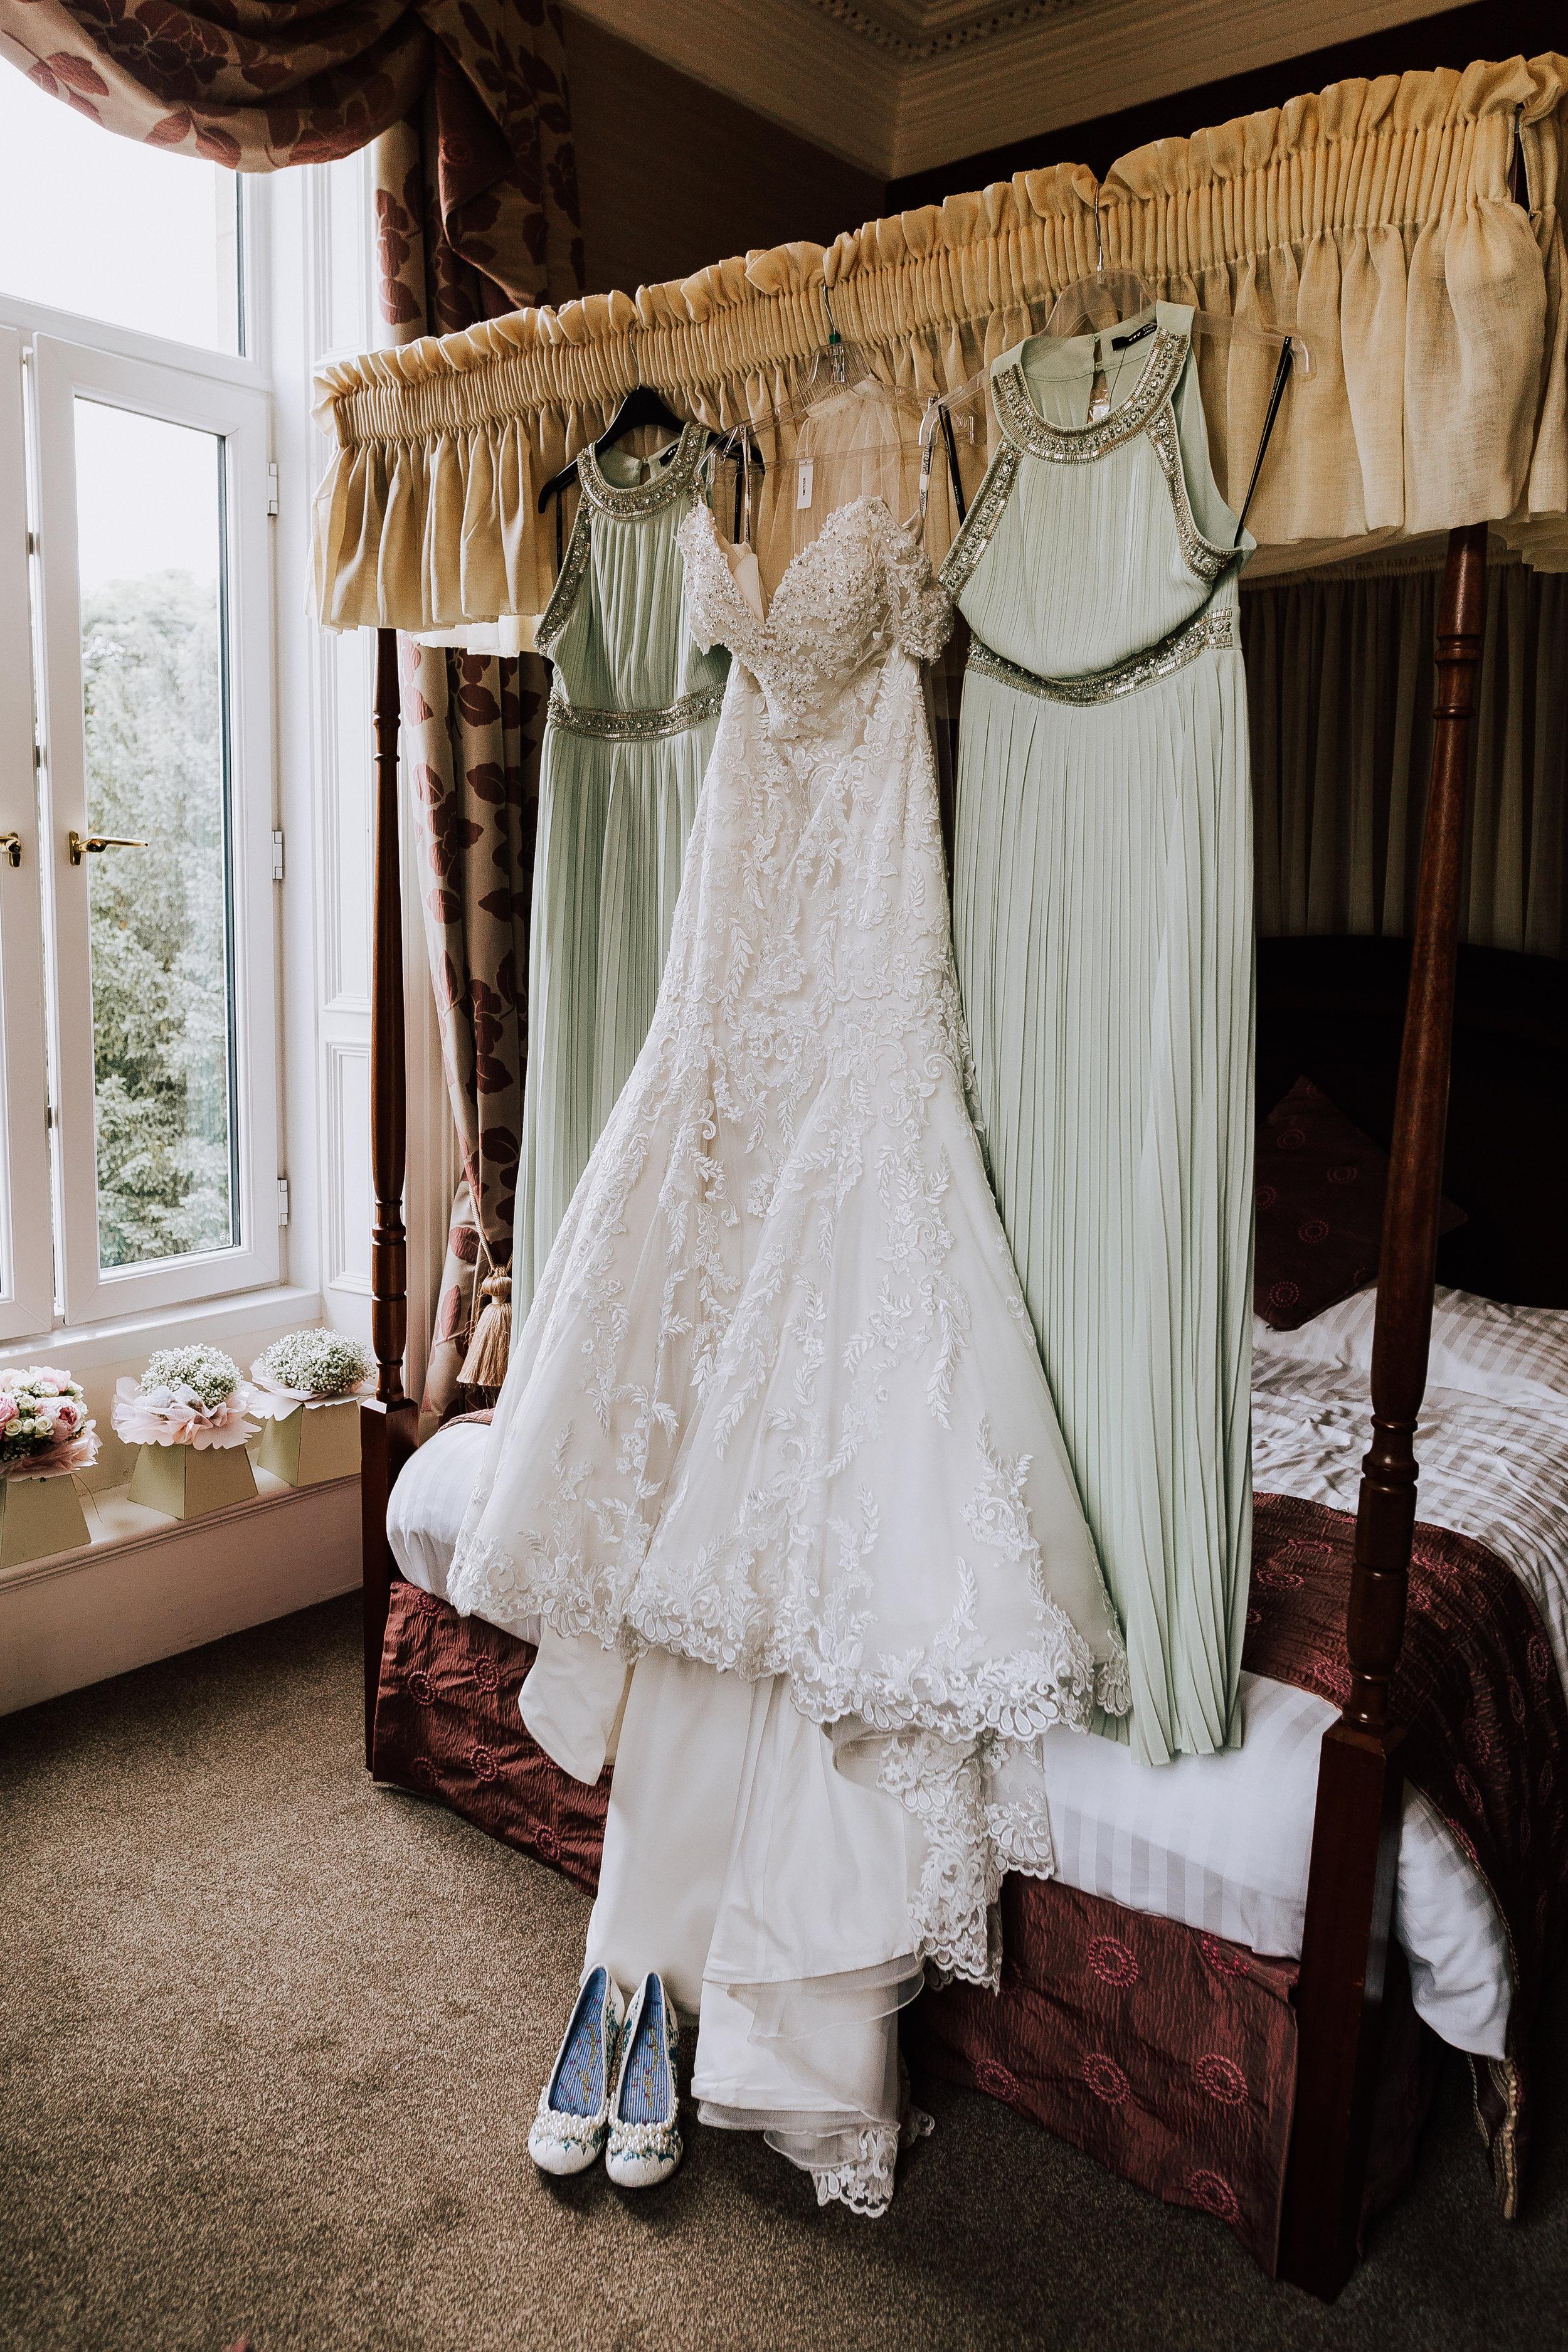 05_09_Heather_Craig_Astley Hotel-16.JPG